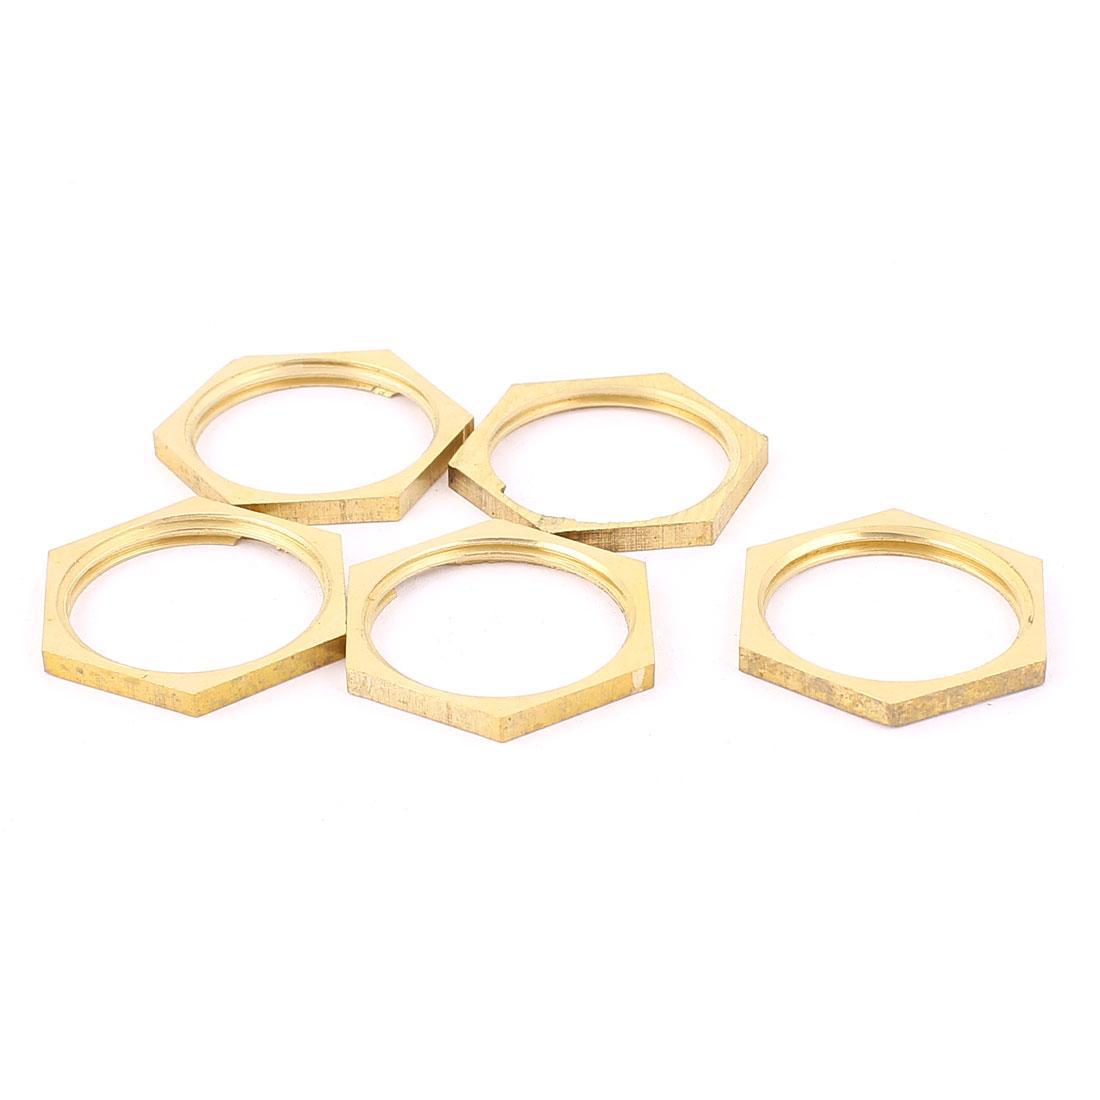 3/4BSP Female Thread Brass Pipe Fitting Hex Lock Nut Brass Tone 5pcs